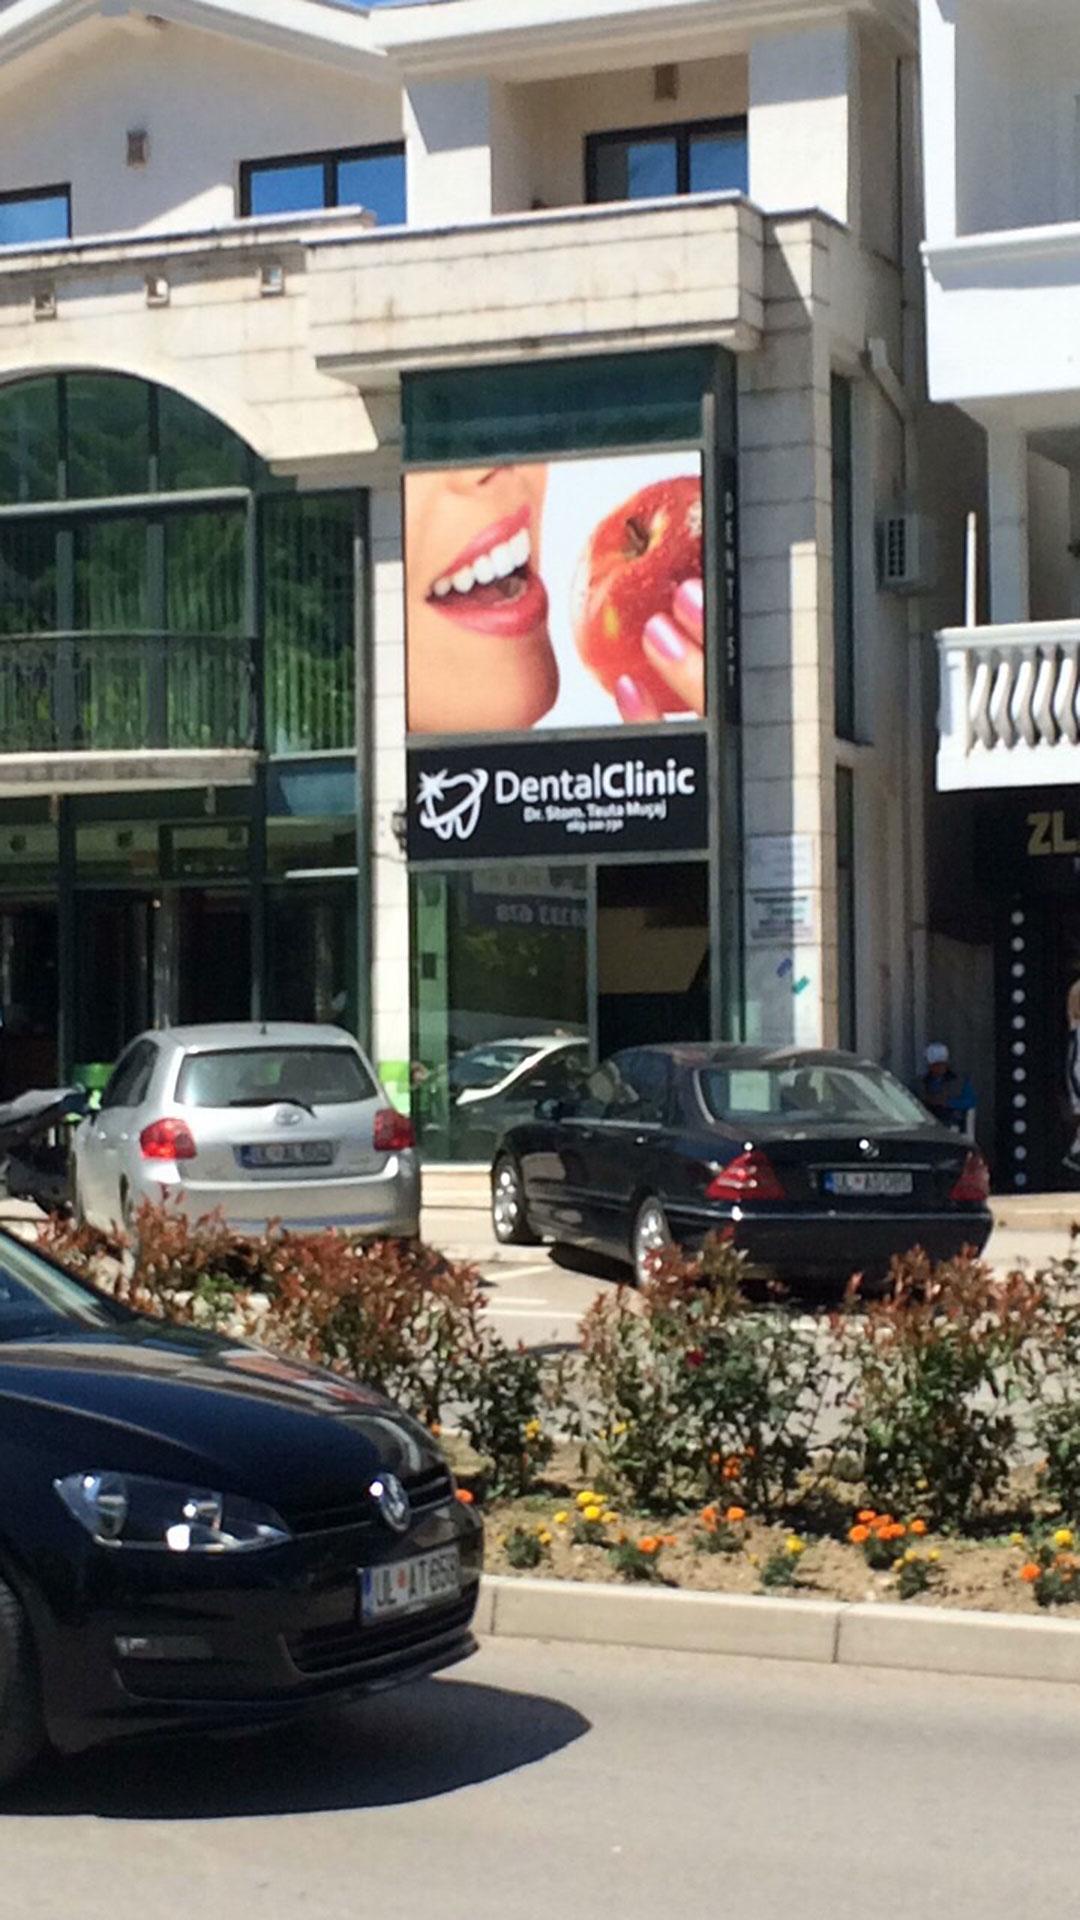 Dr-Teuta-Mucaj-Kalabrezi_General-Dentist-Ulcinj-Ulqin-Montenegro_Building